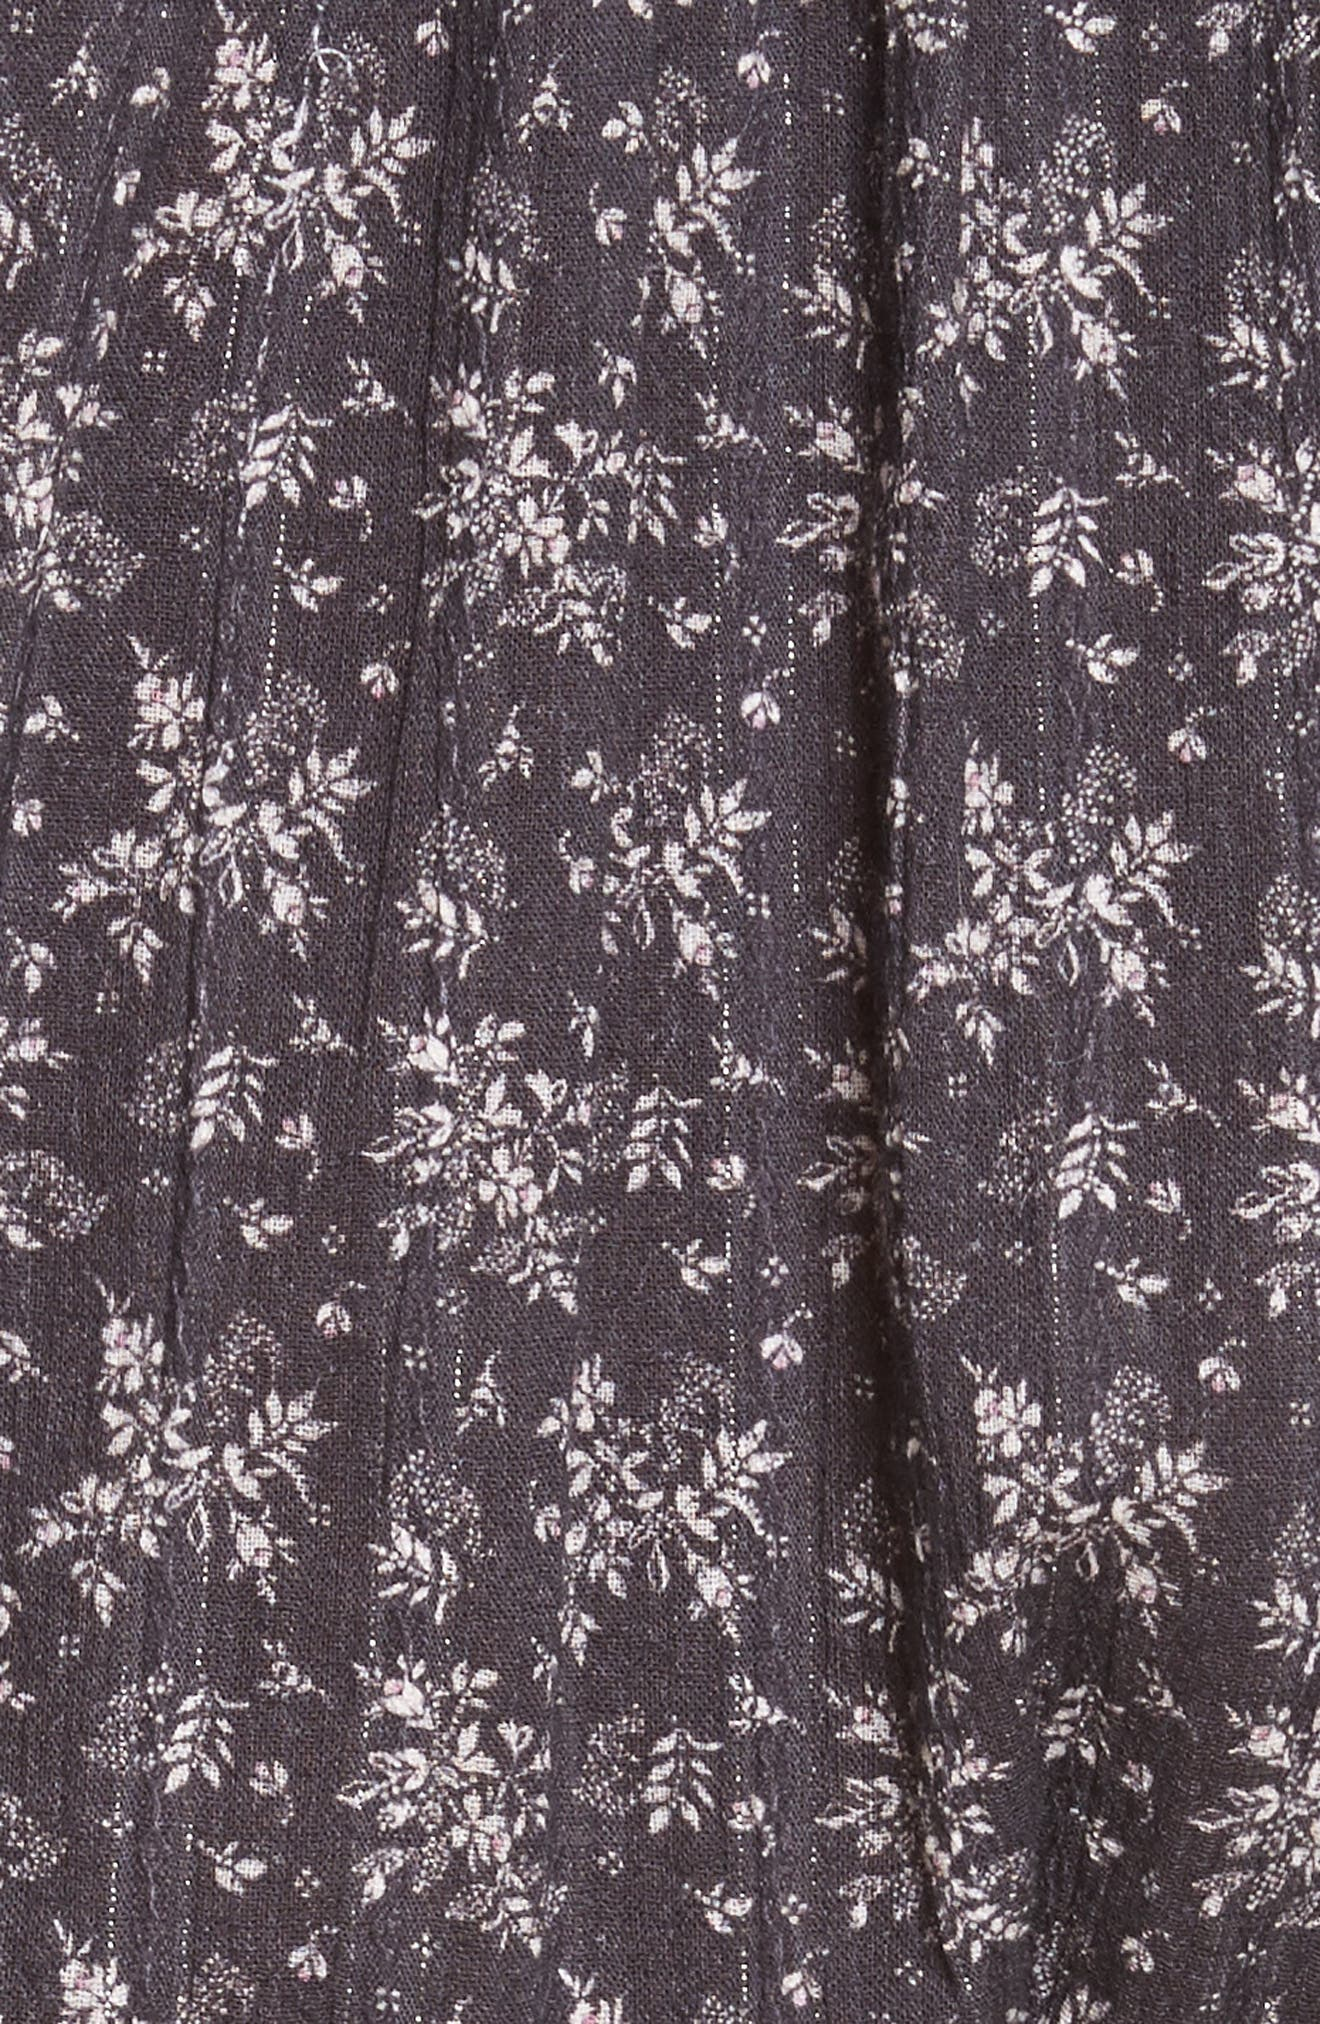 Angelique Long Sleeve Dress,                             Alternate thumbnail 5, color,                             014